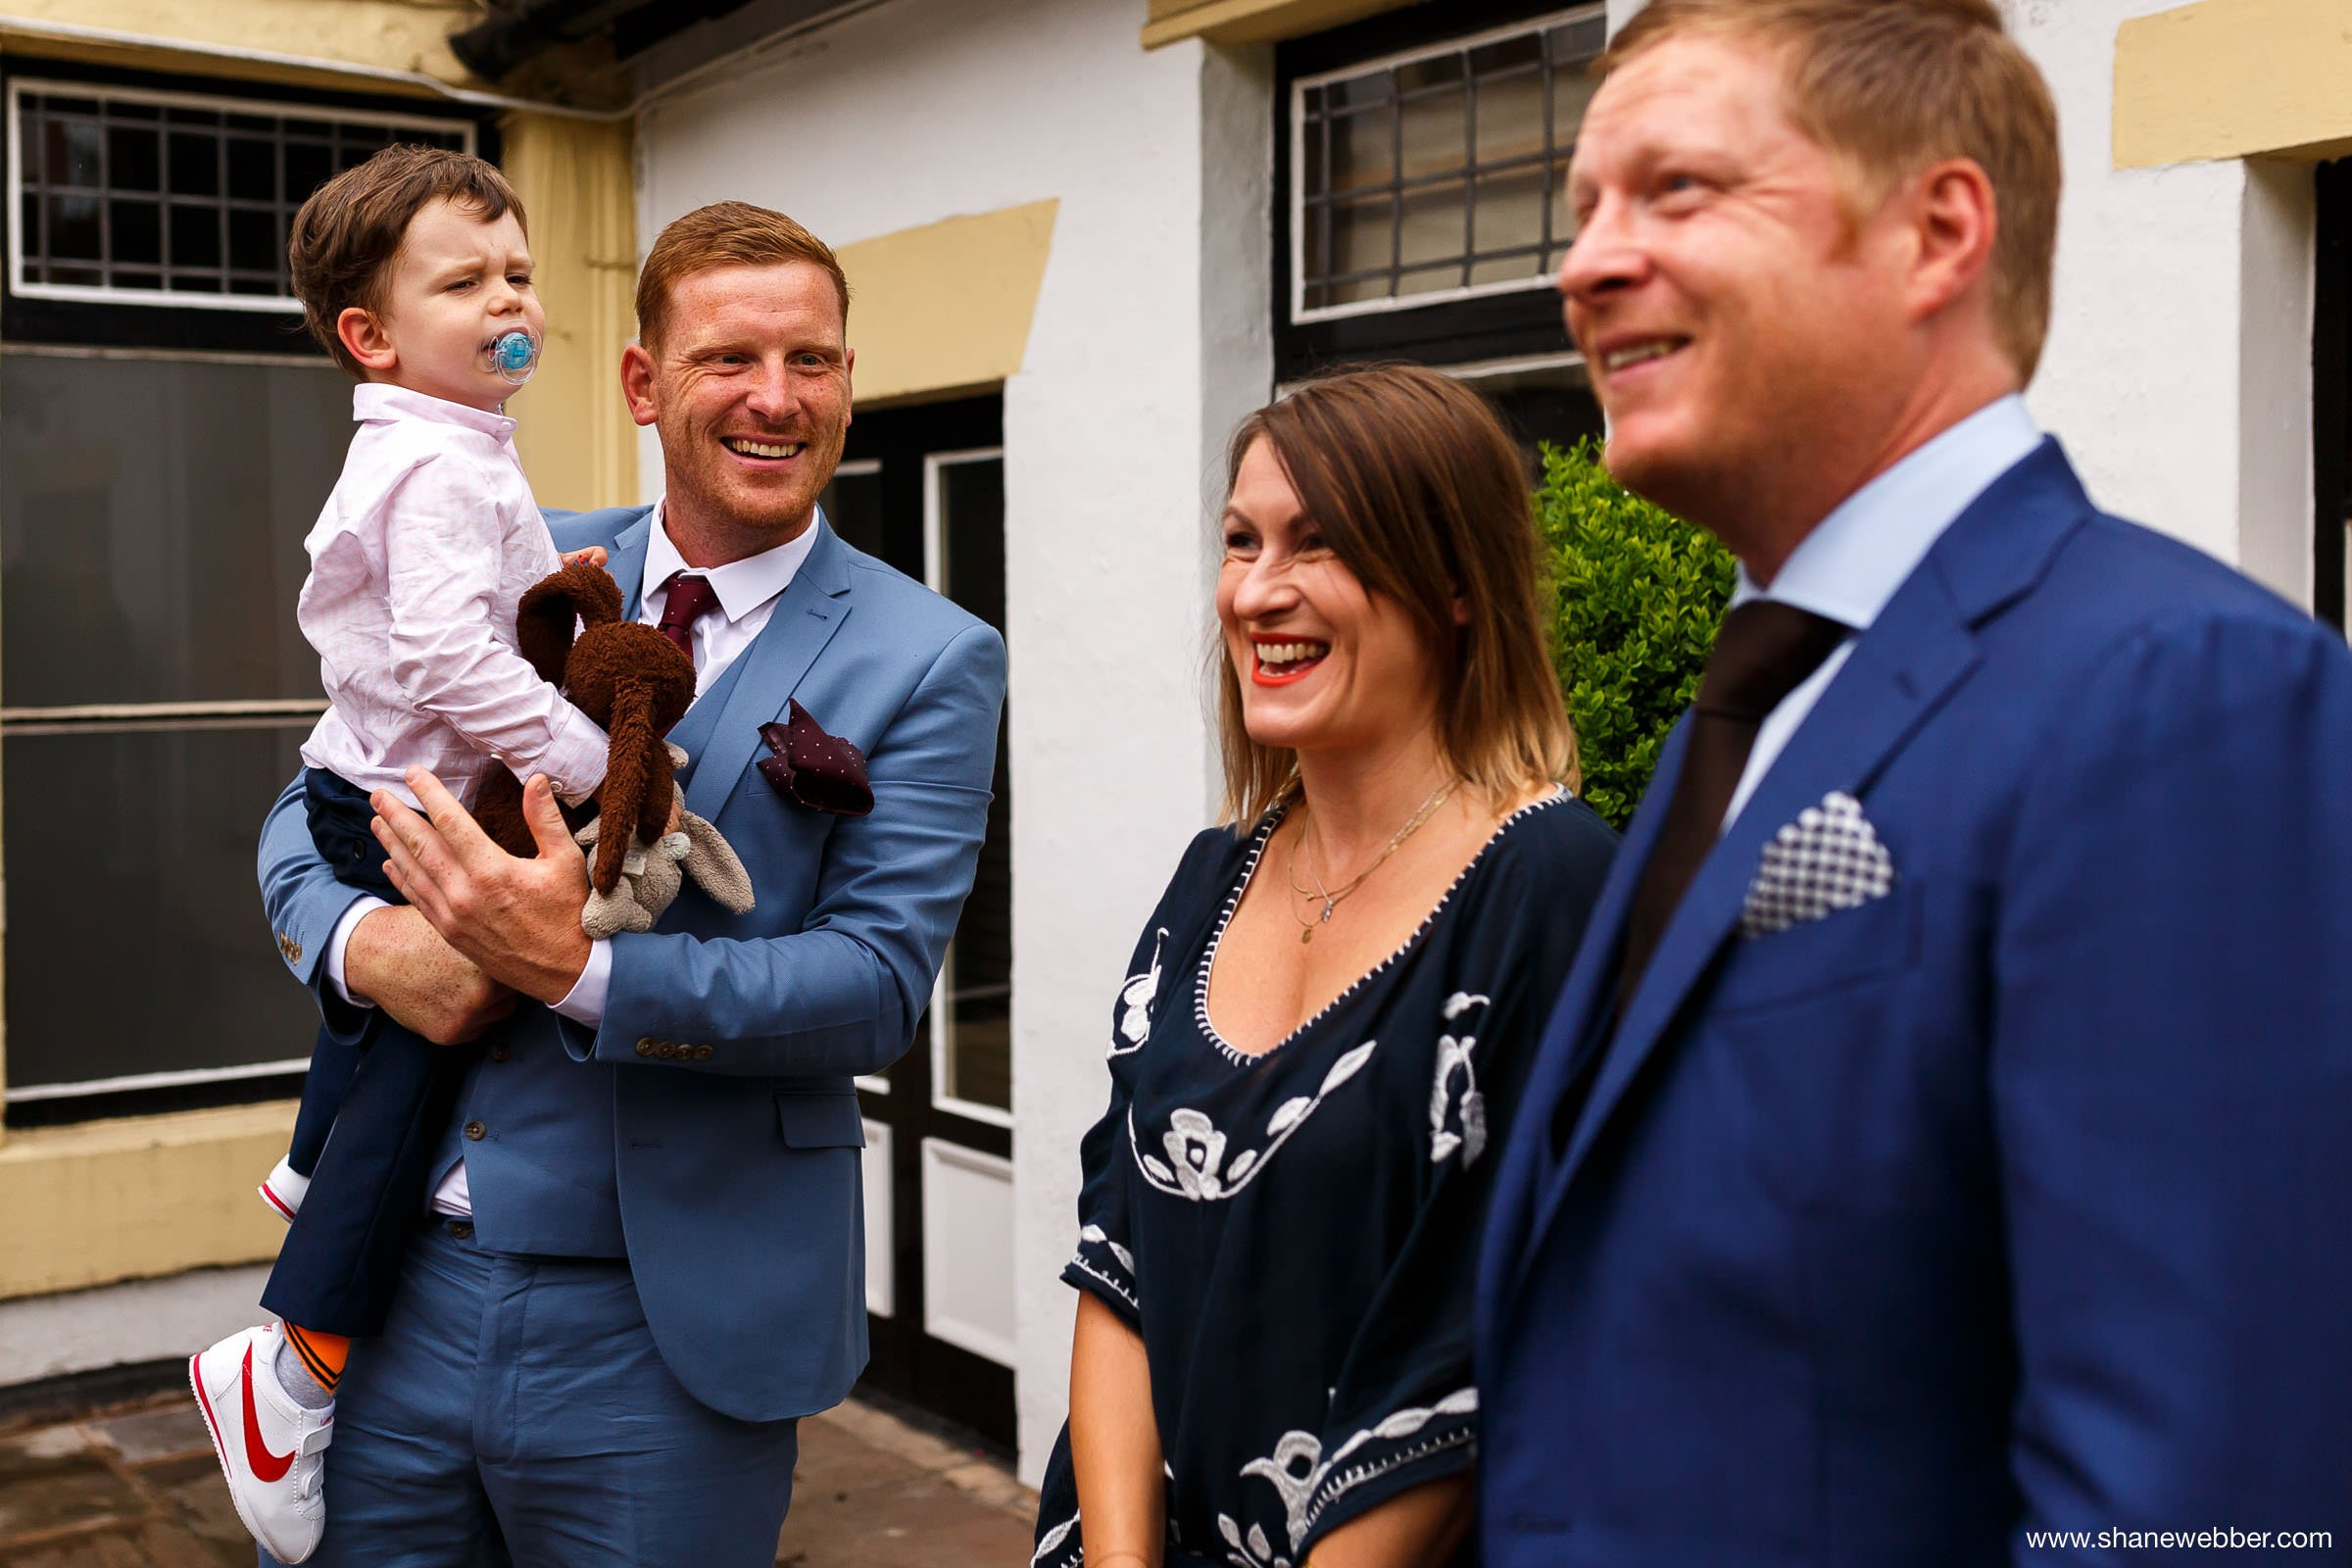 Natural photos of wedding guests